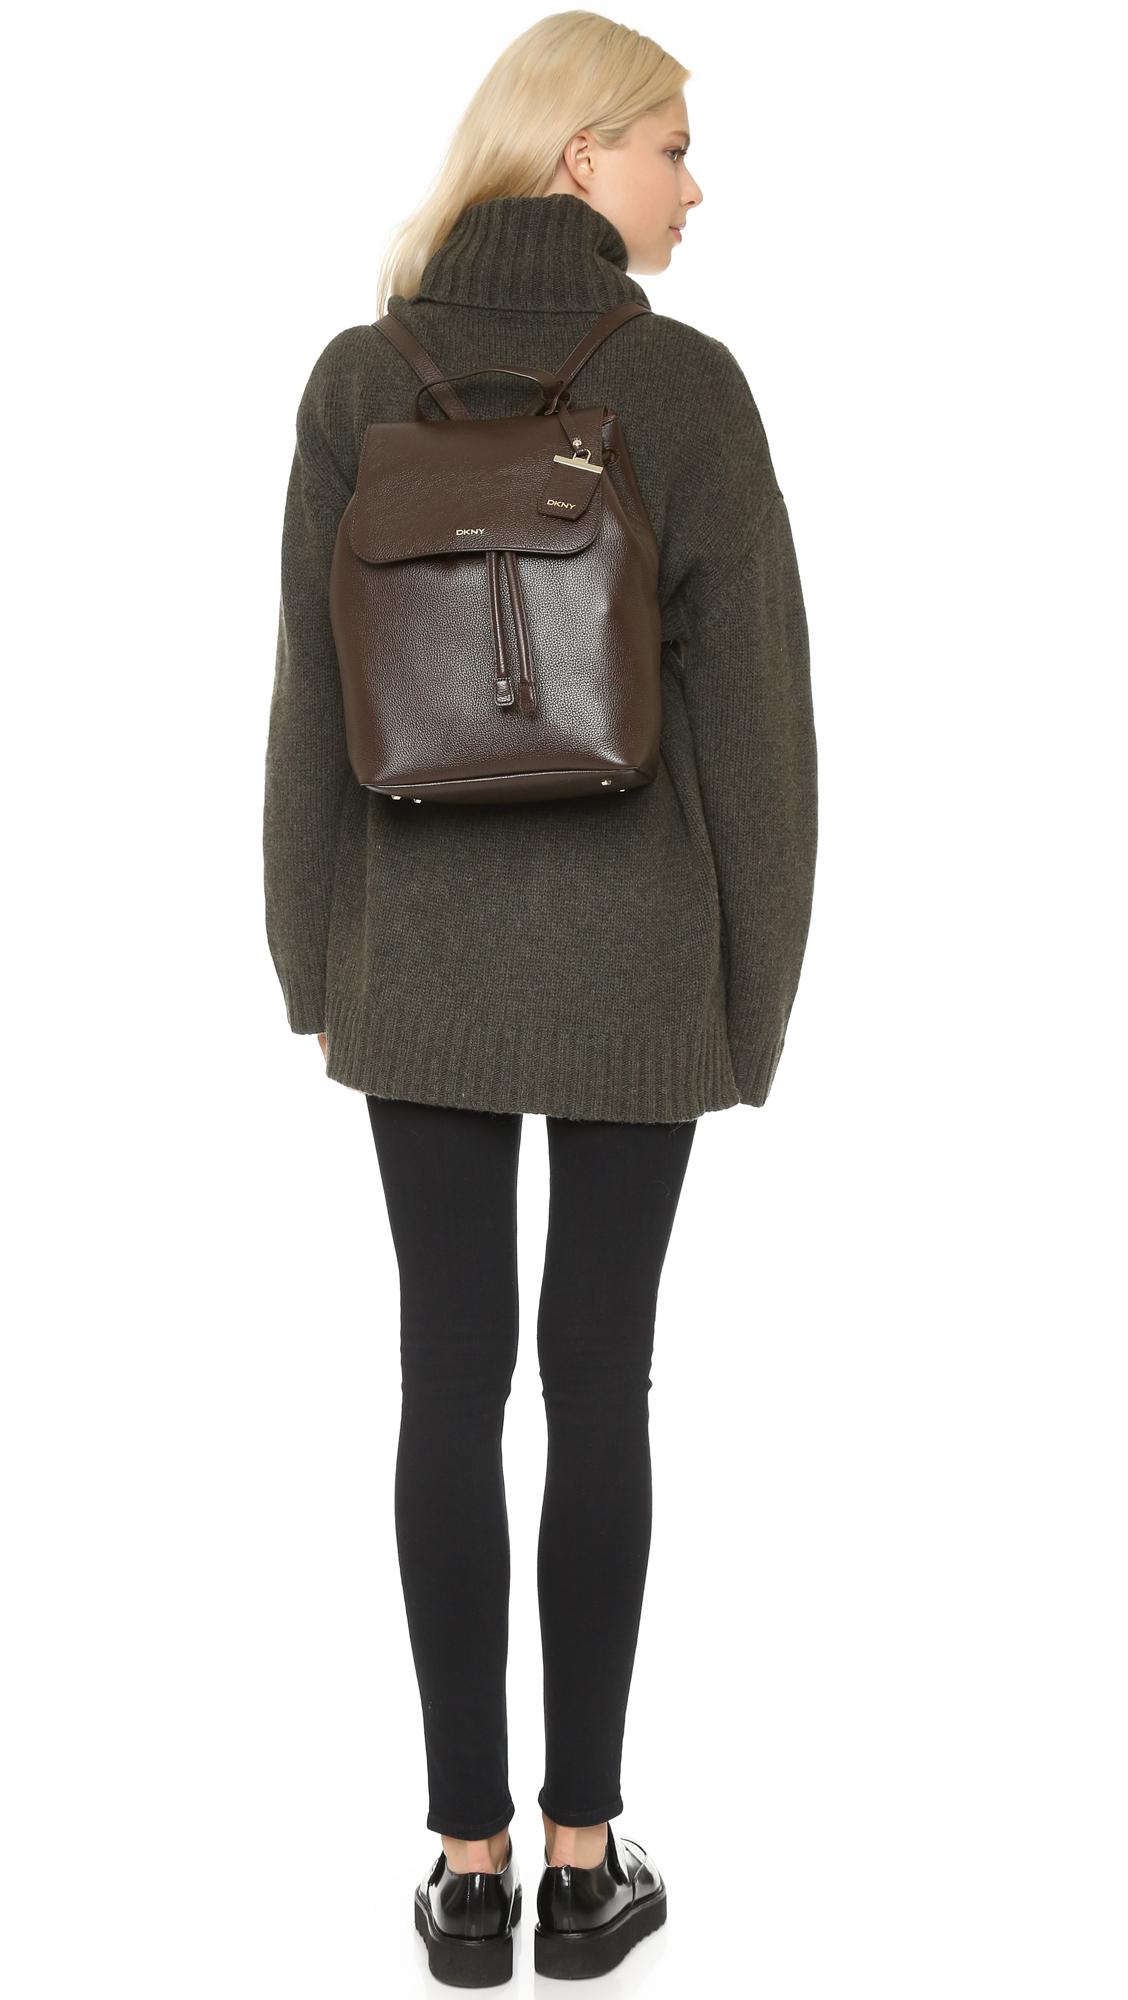 Lyst - Dkny Ego Leather Backpack - Dark Brown in Brown